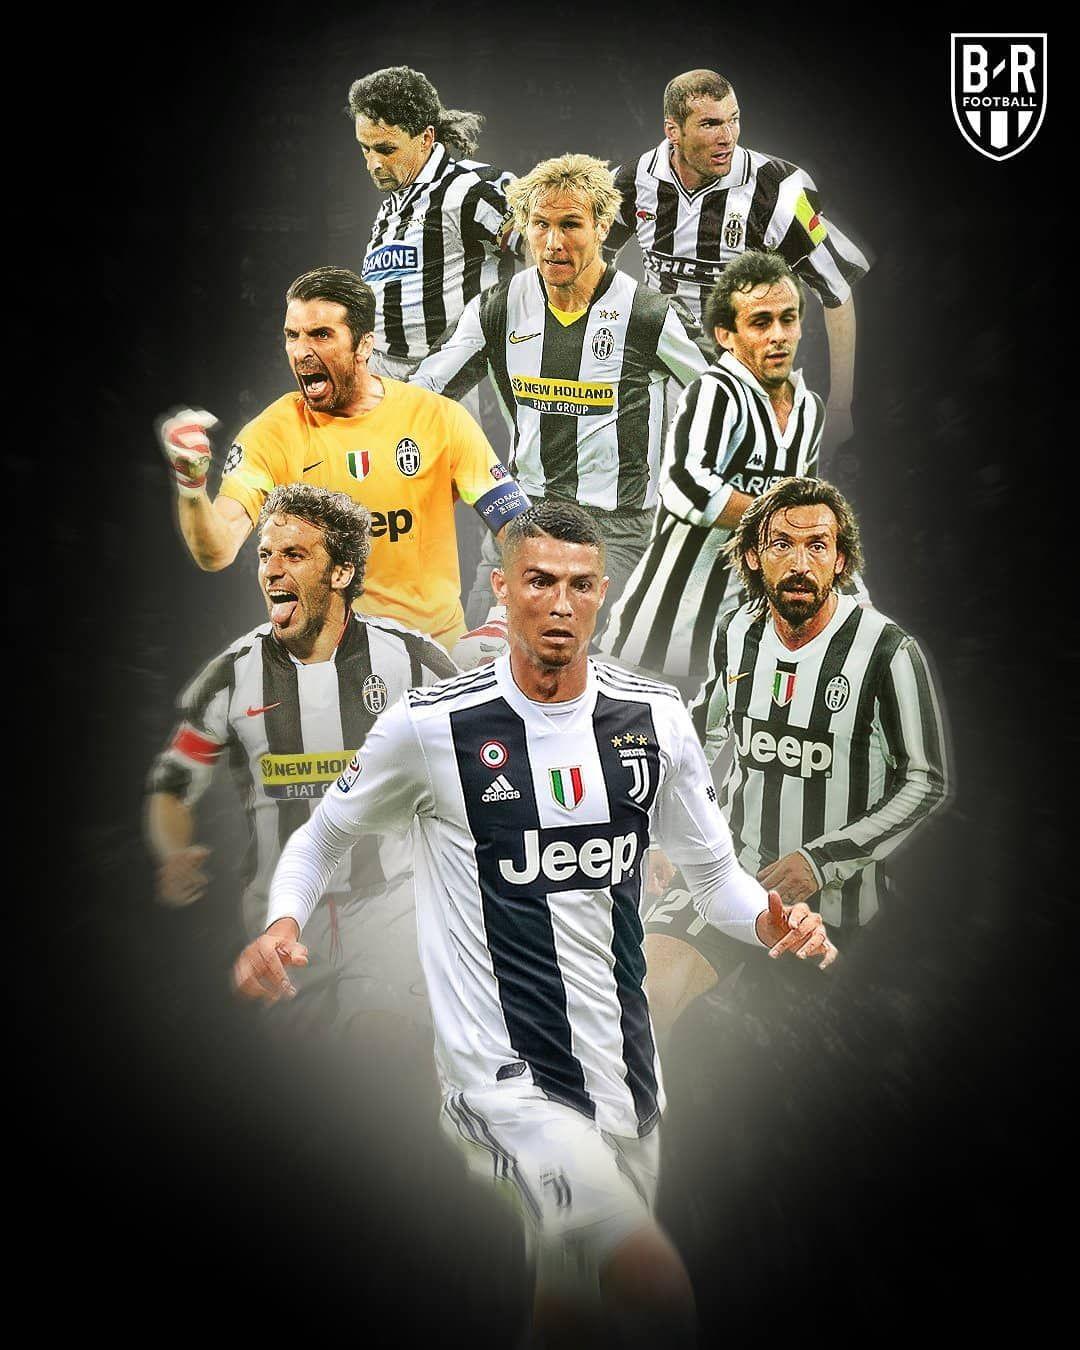 Pin di János Berze su Juventus Stadi di calcio